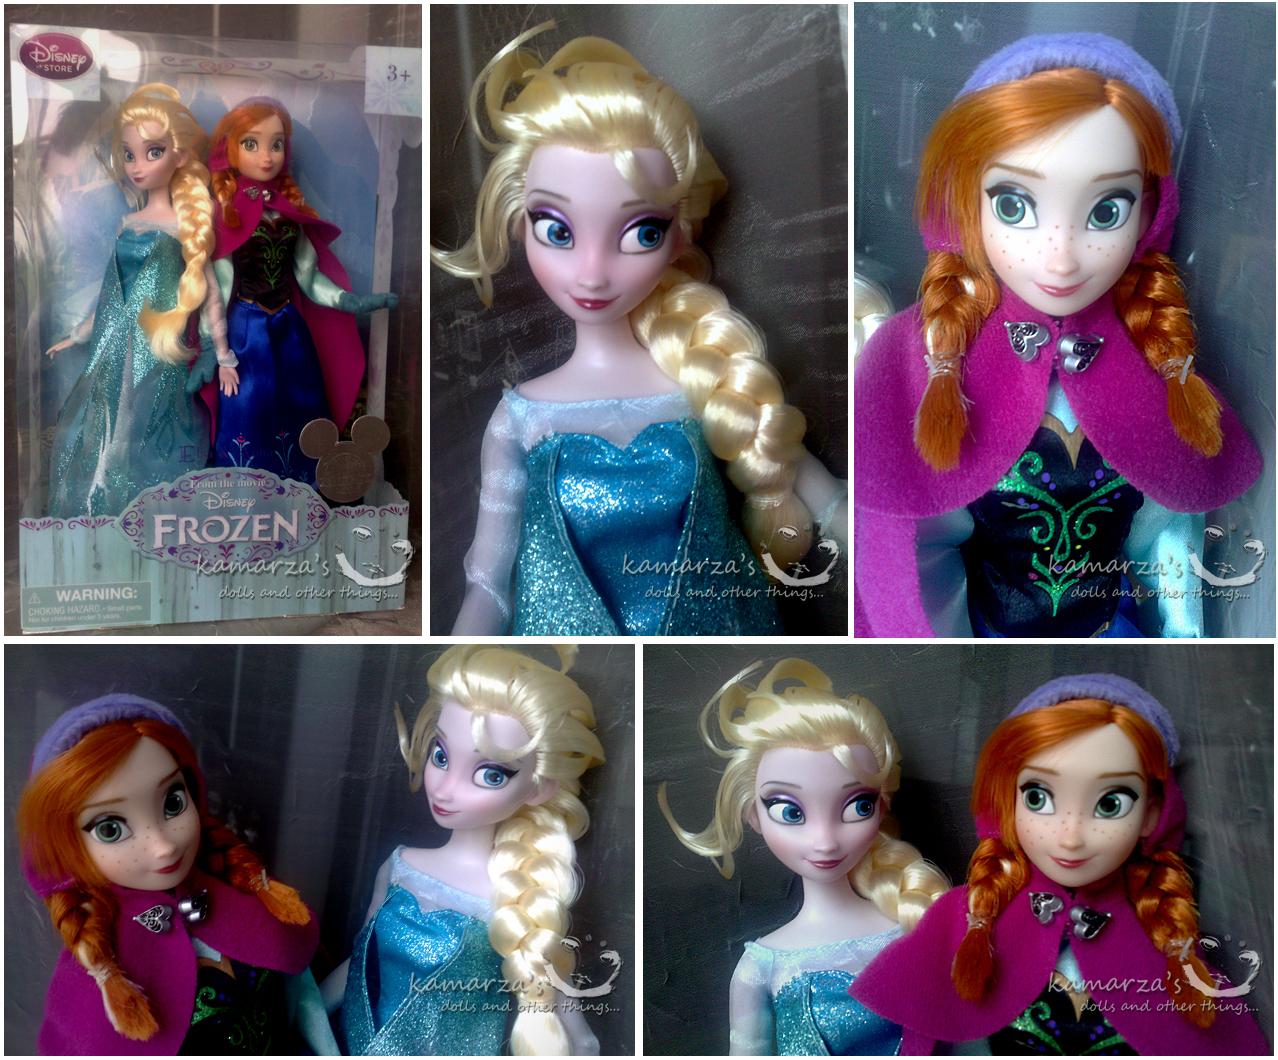 Frozen Gambar Elsa And Anna Boneka Hd Wallpaper And Background Foto